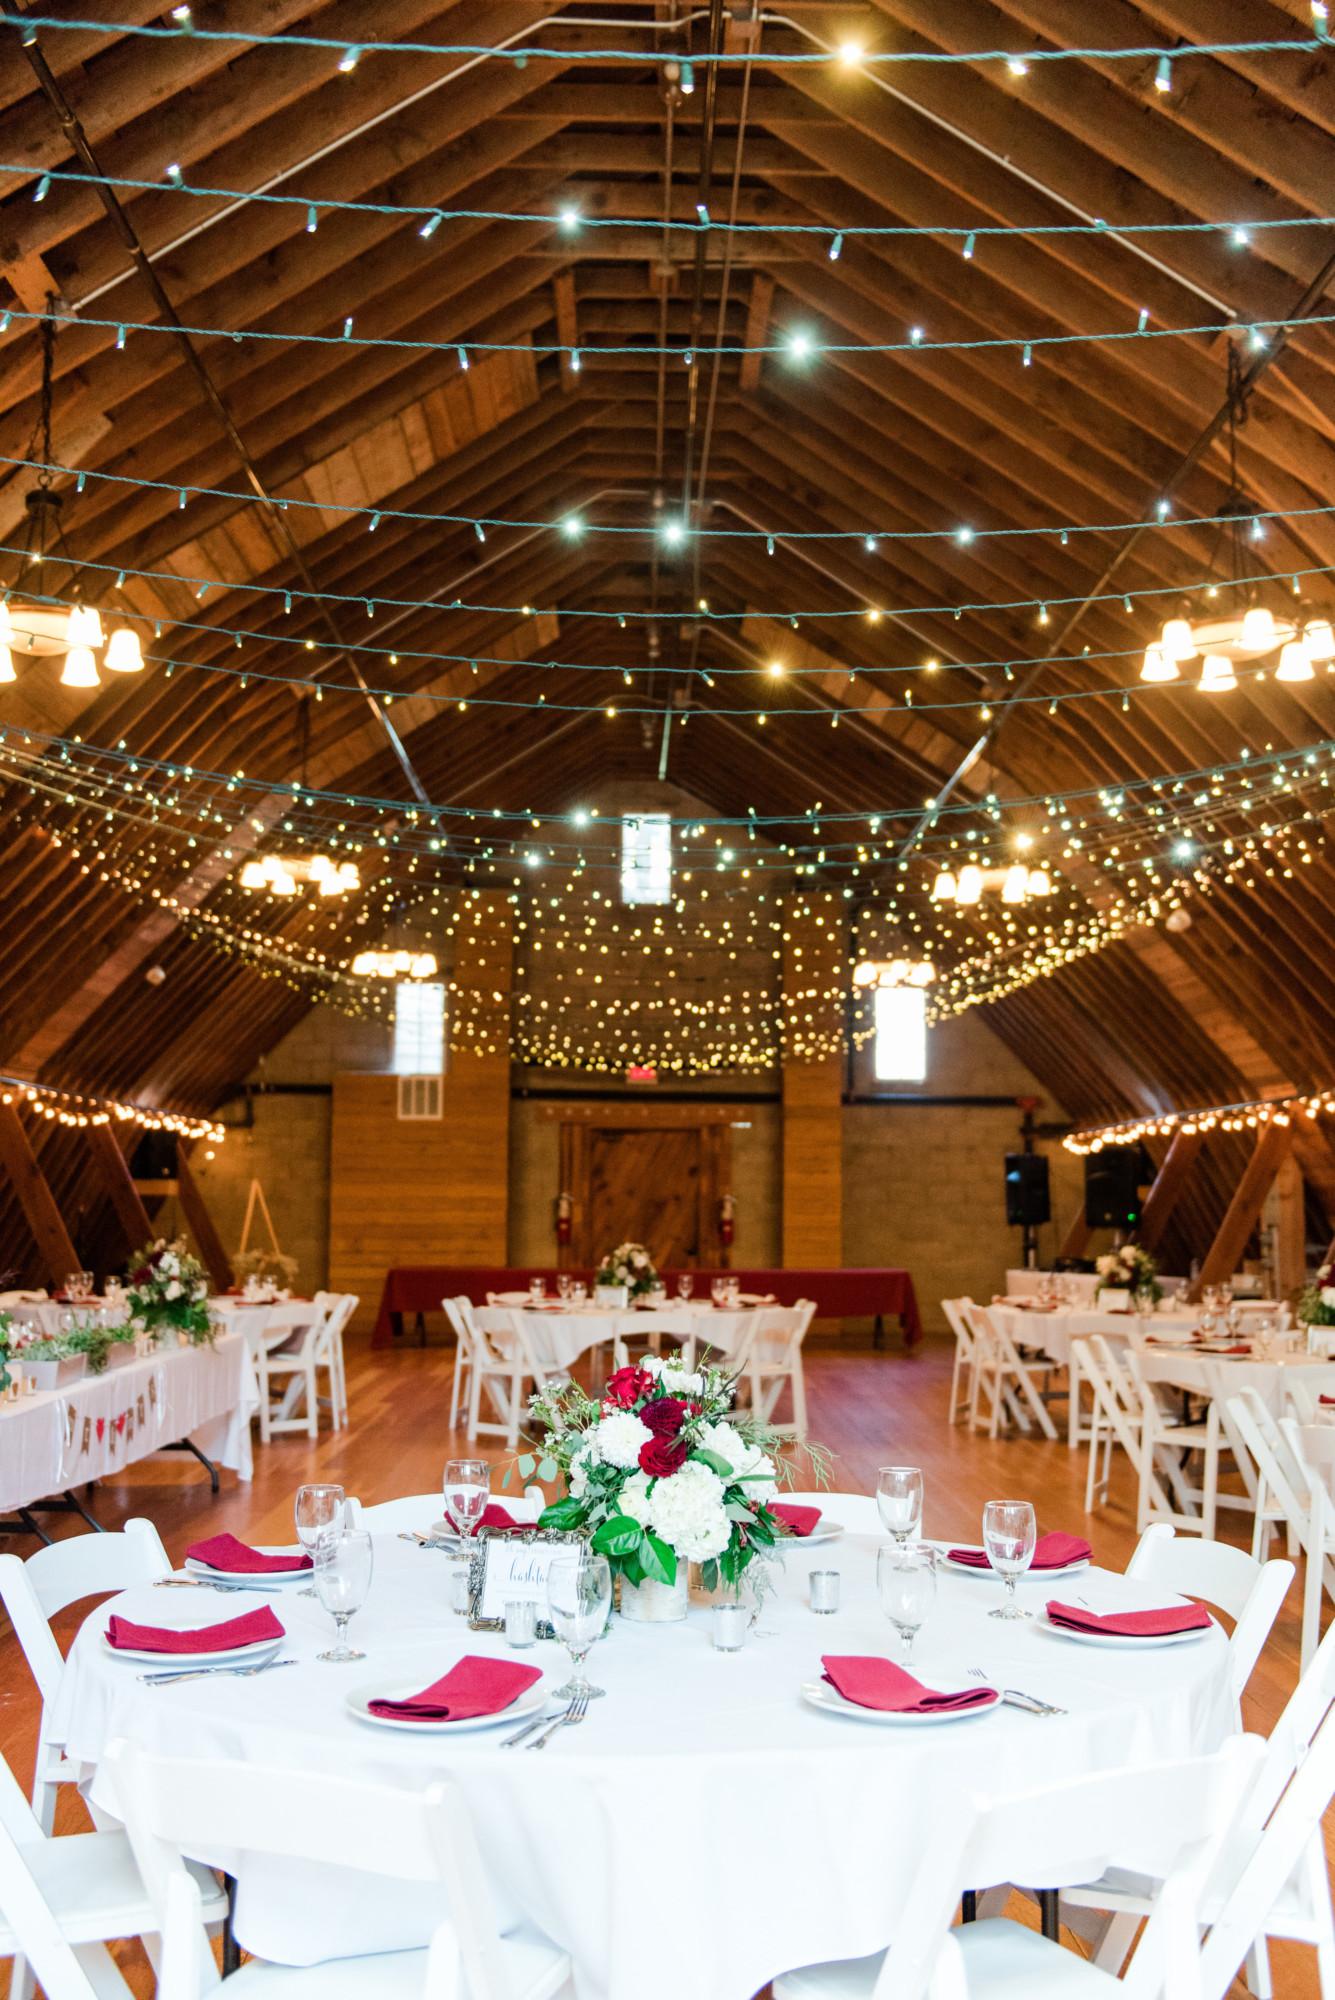 leavenworth event venue in washington state pine river ranch